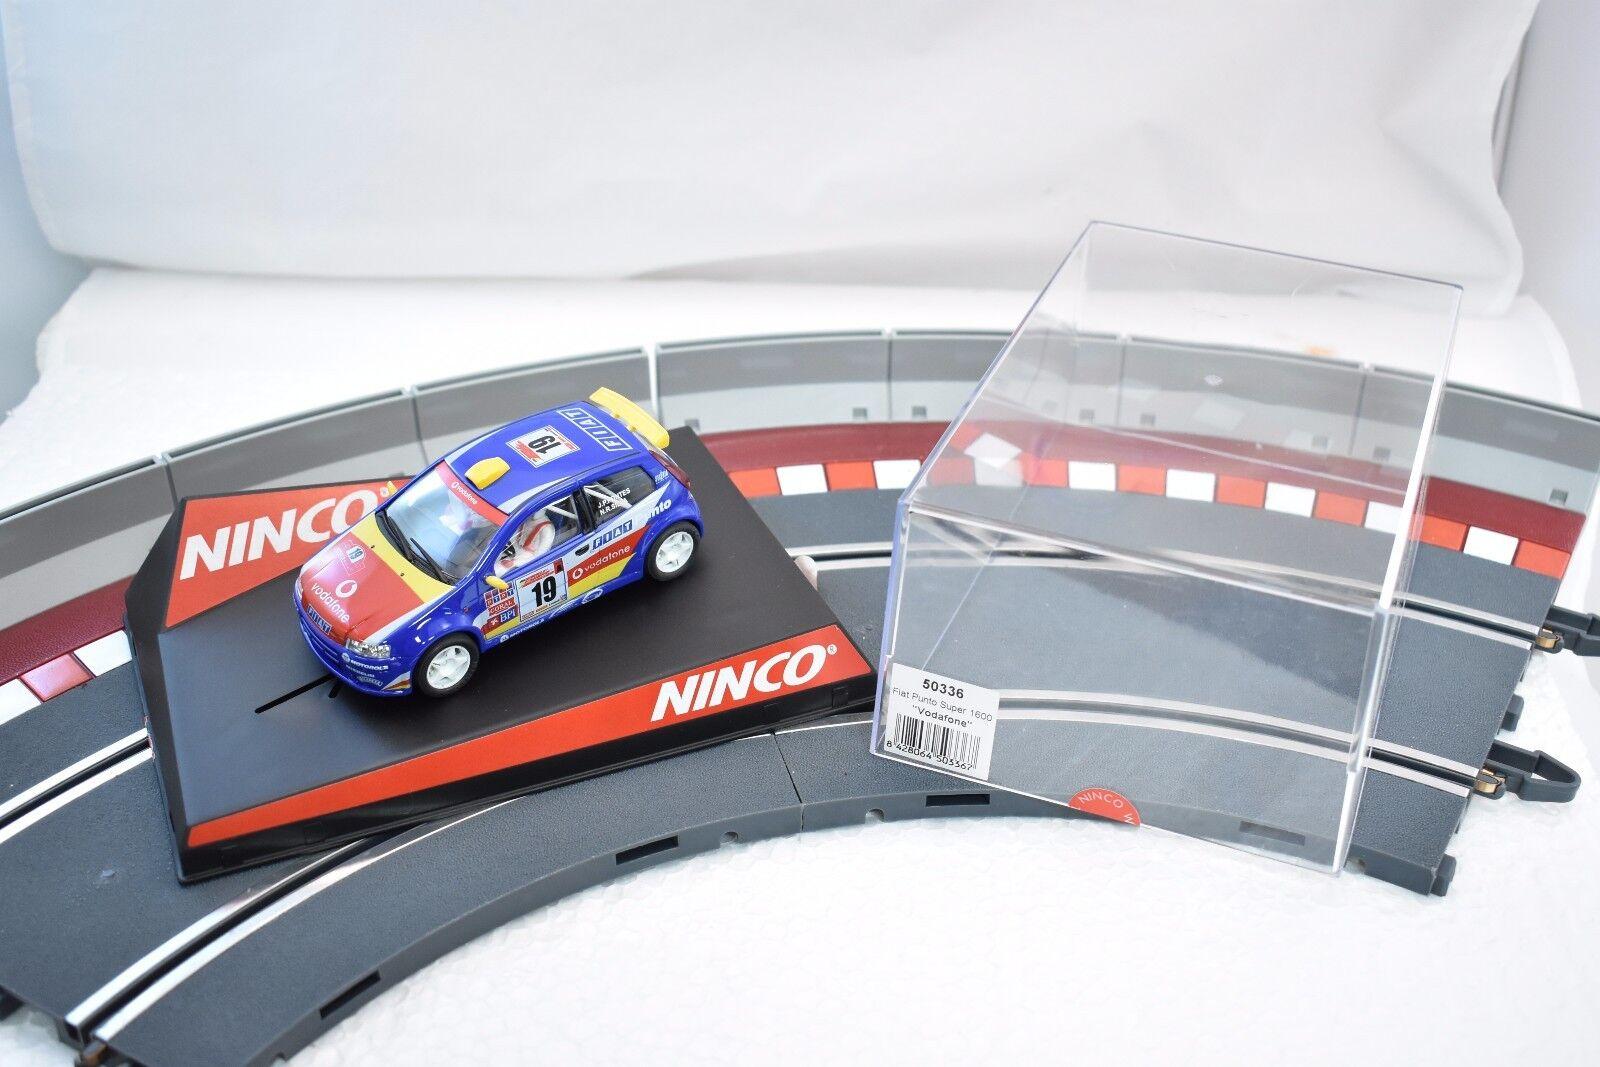 NINCO 50336 1 32 SLOT CAR FIAT PUNTO SUPER 1600  VODAFONE